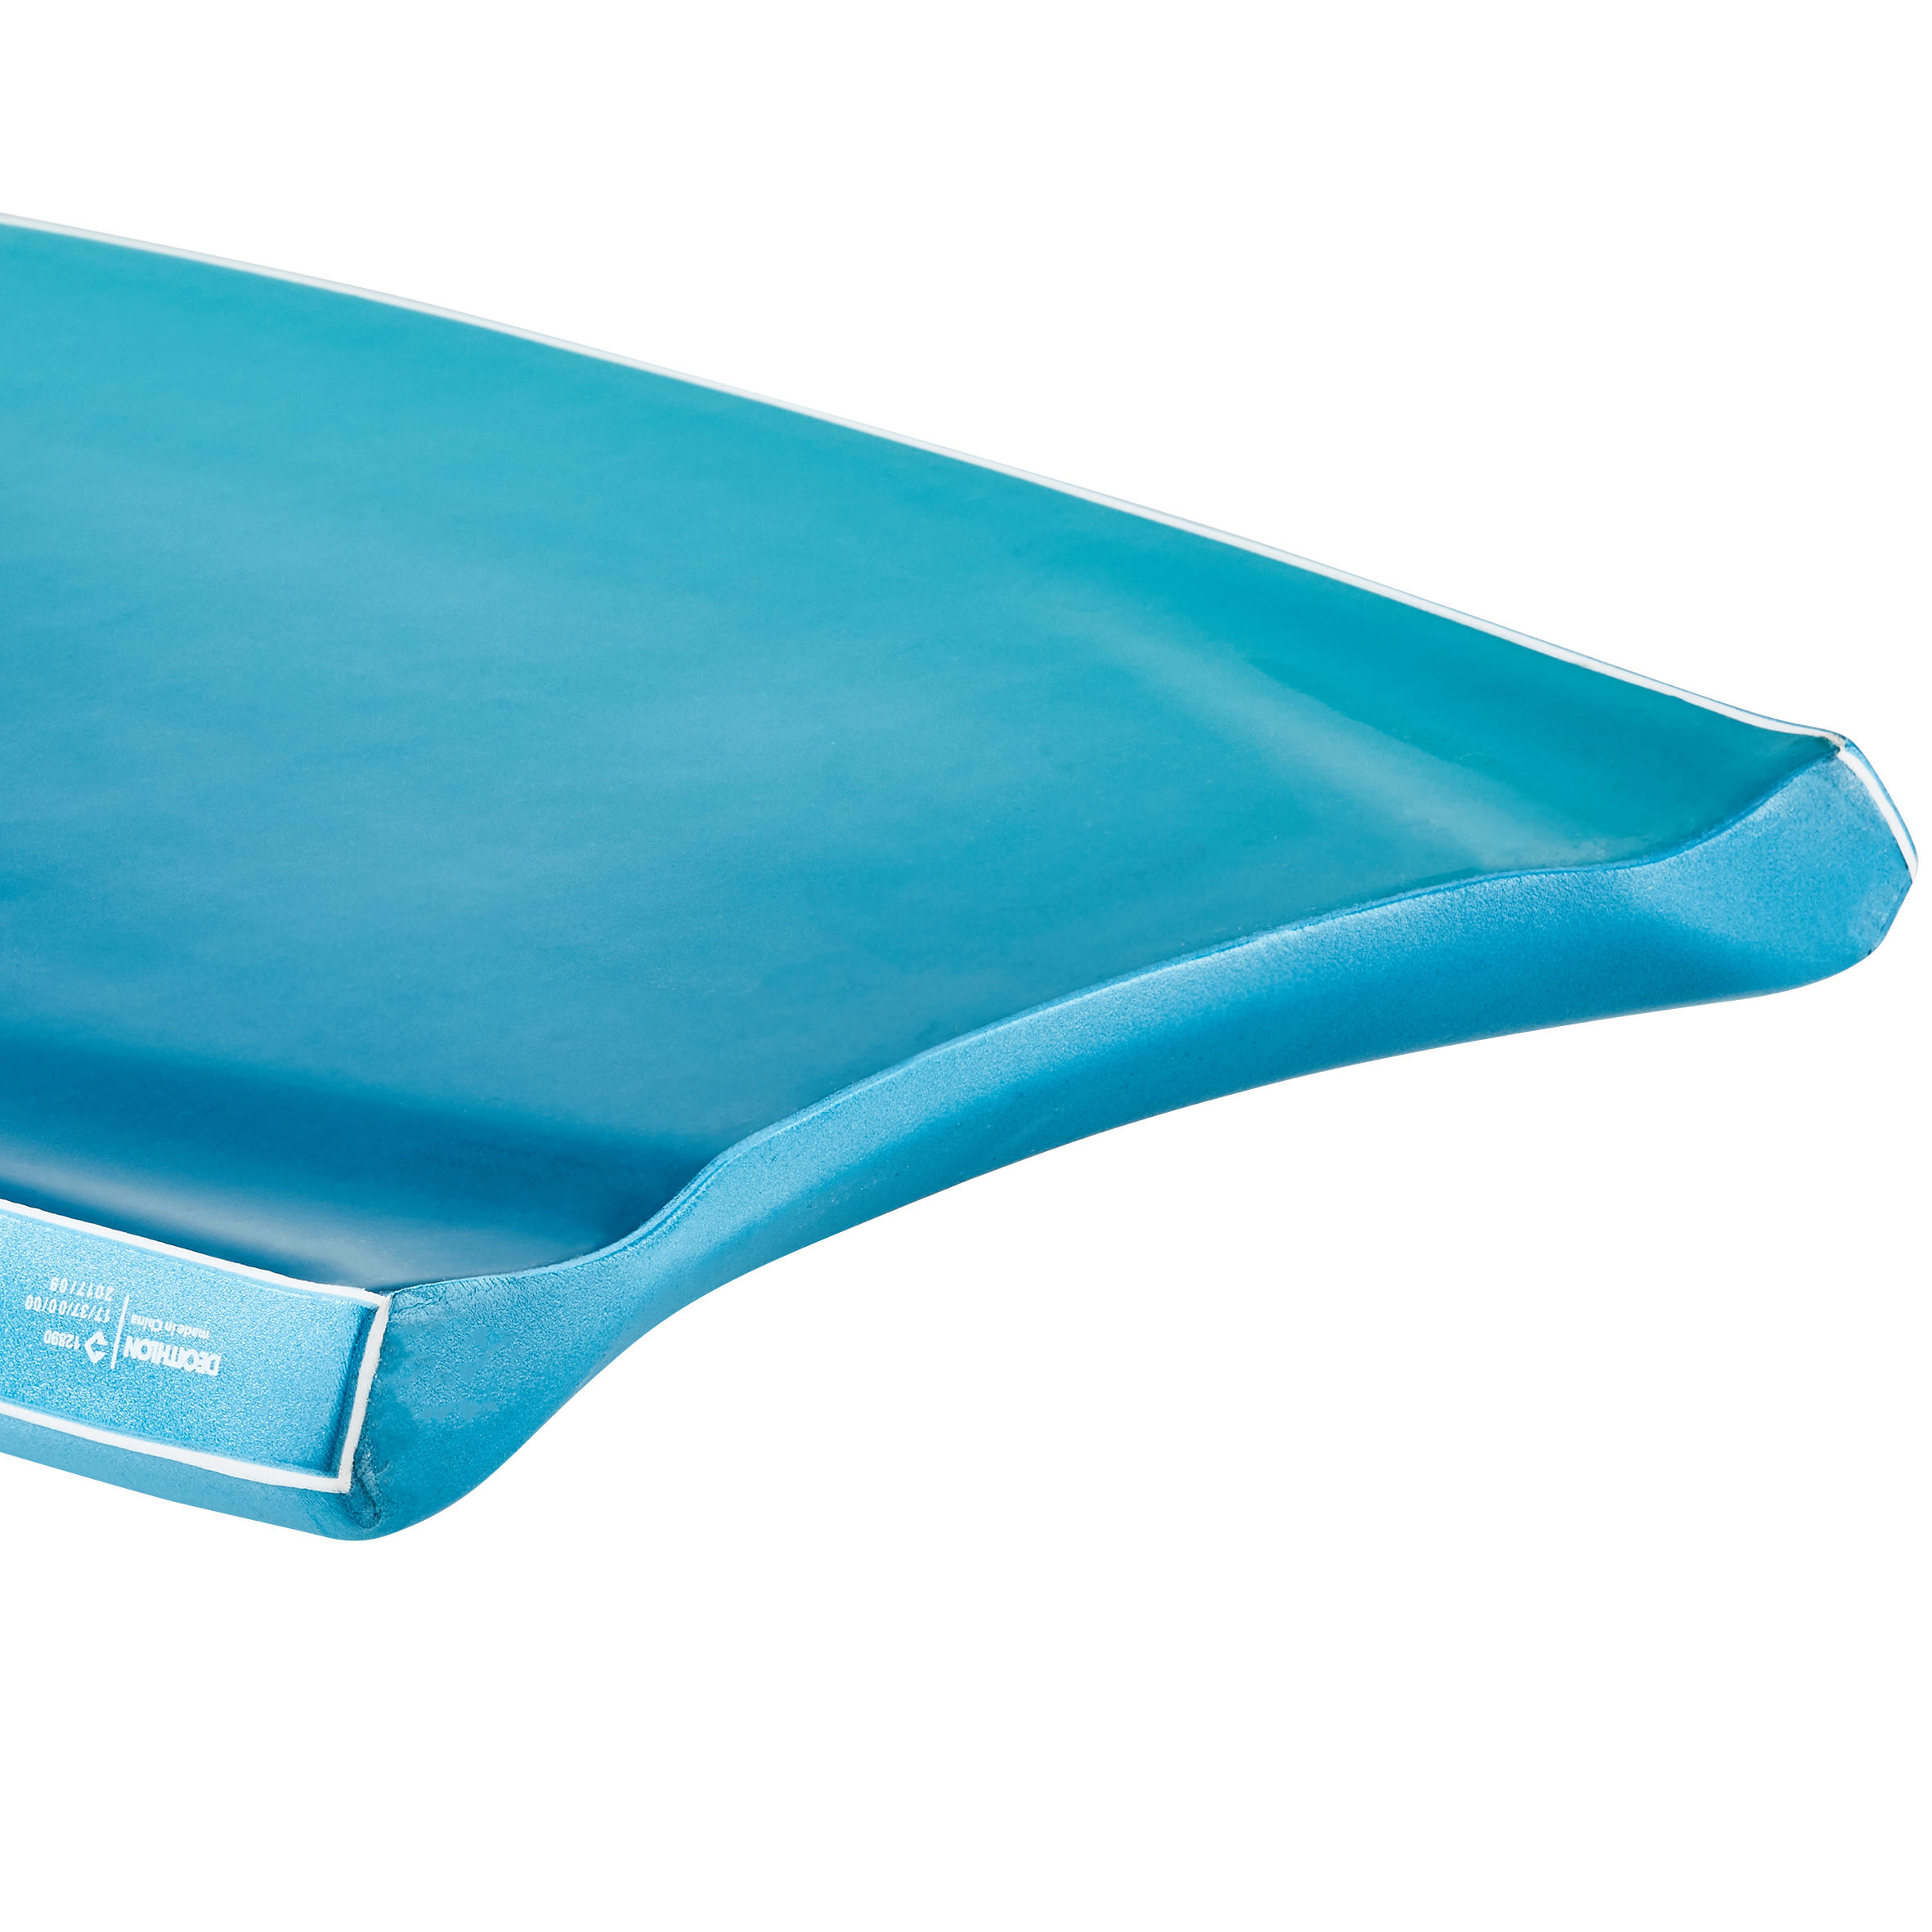 Bodyboard 500 42_QUOTE_ User Height 1.70-1.85m + Leash - Blue